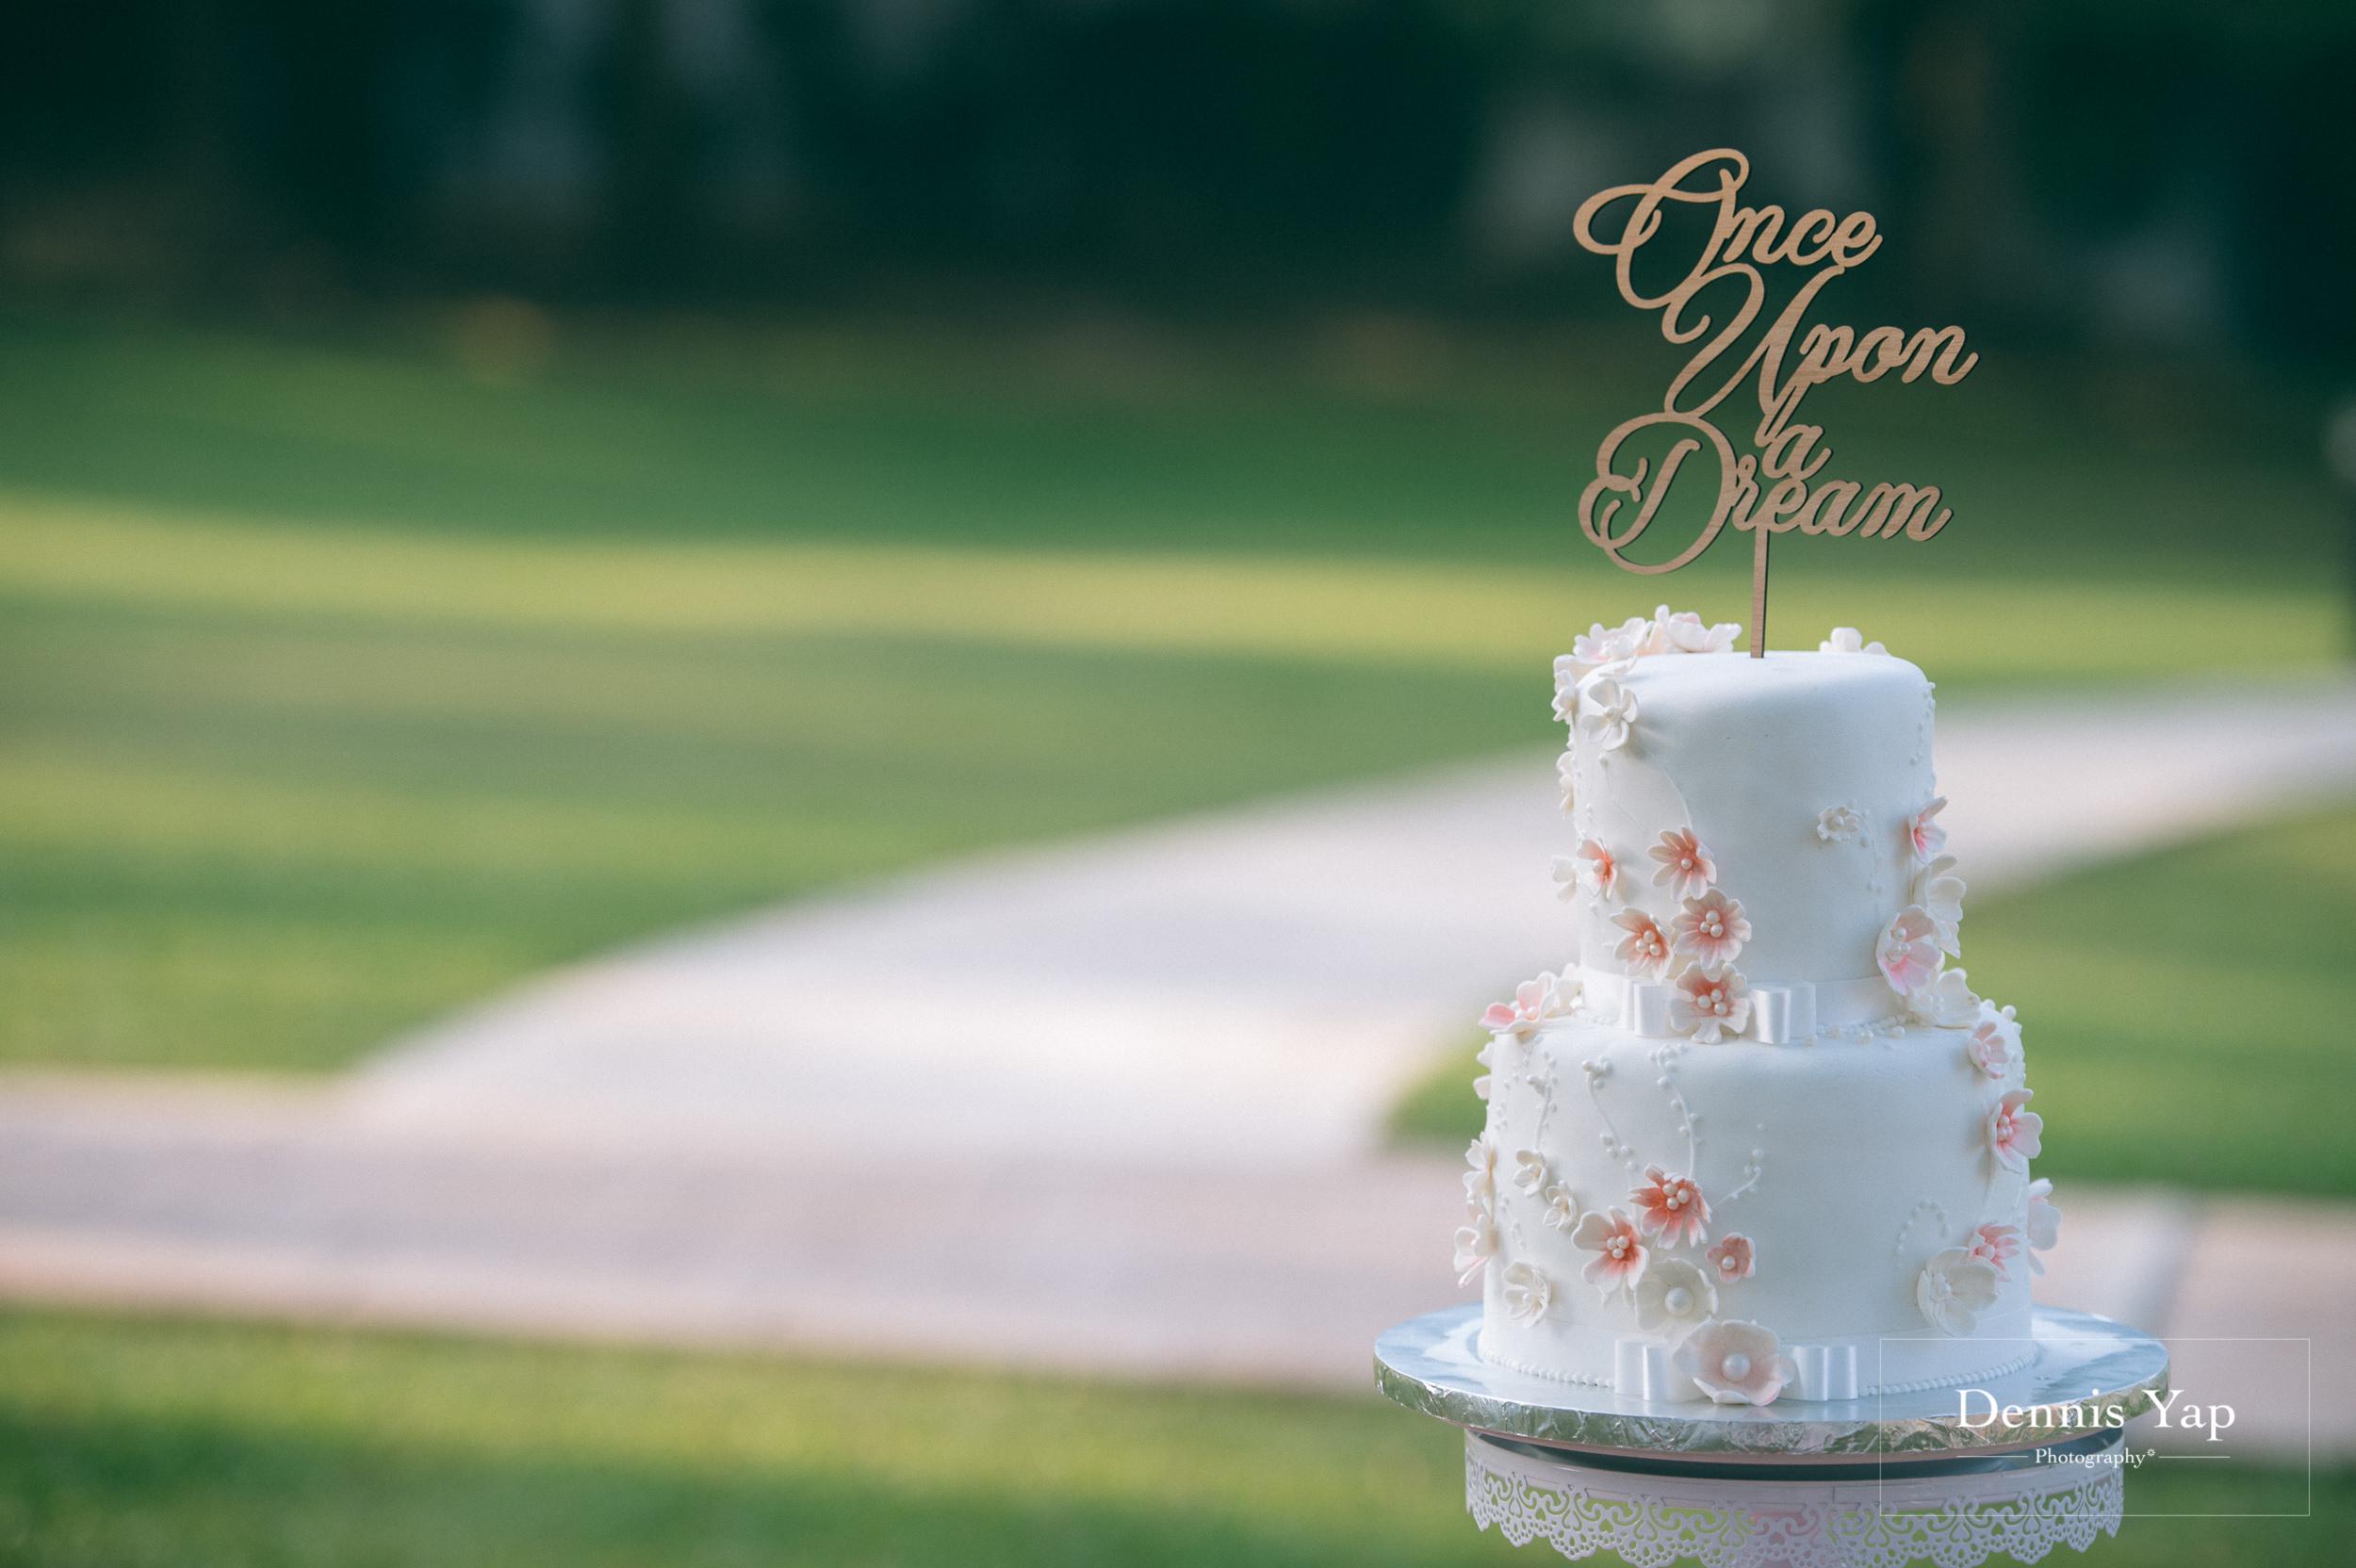 taylai cheng yee garden wedding saujana hotel subang jaya dennis yap photography sunlight-7.jpg